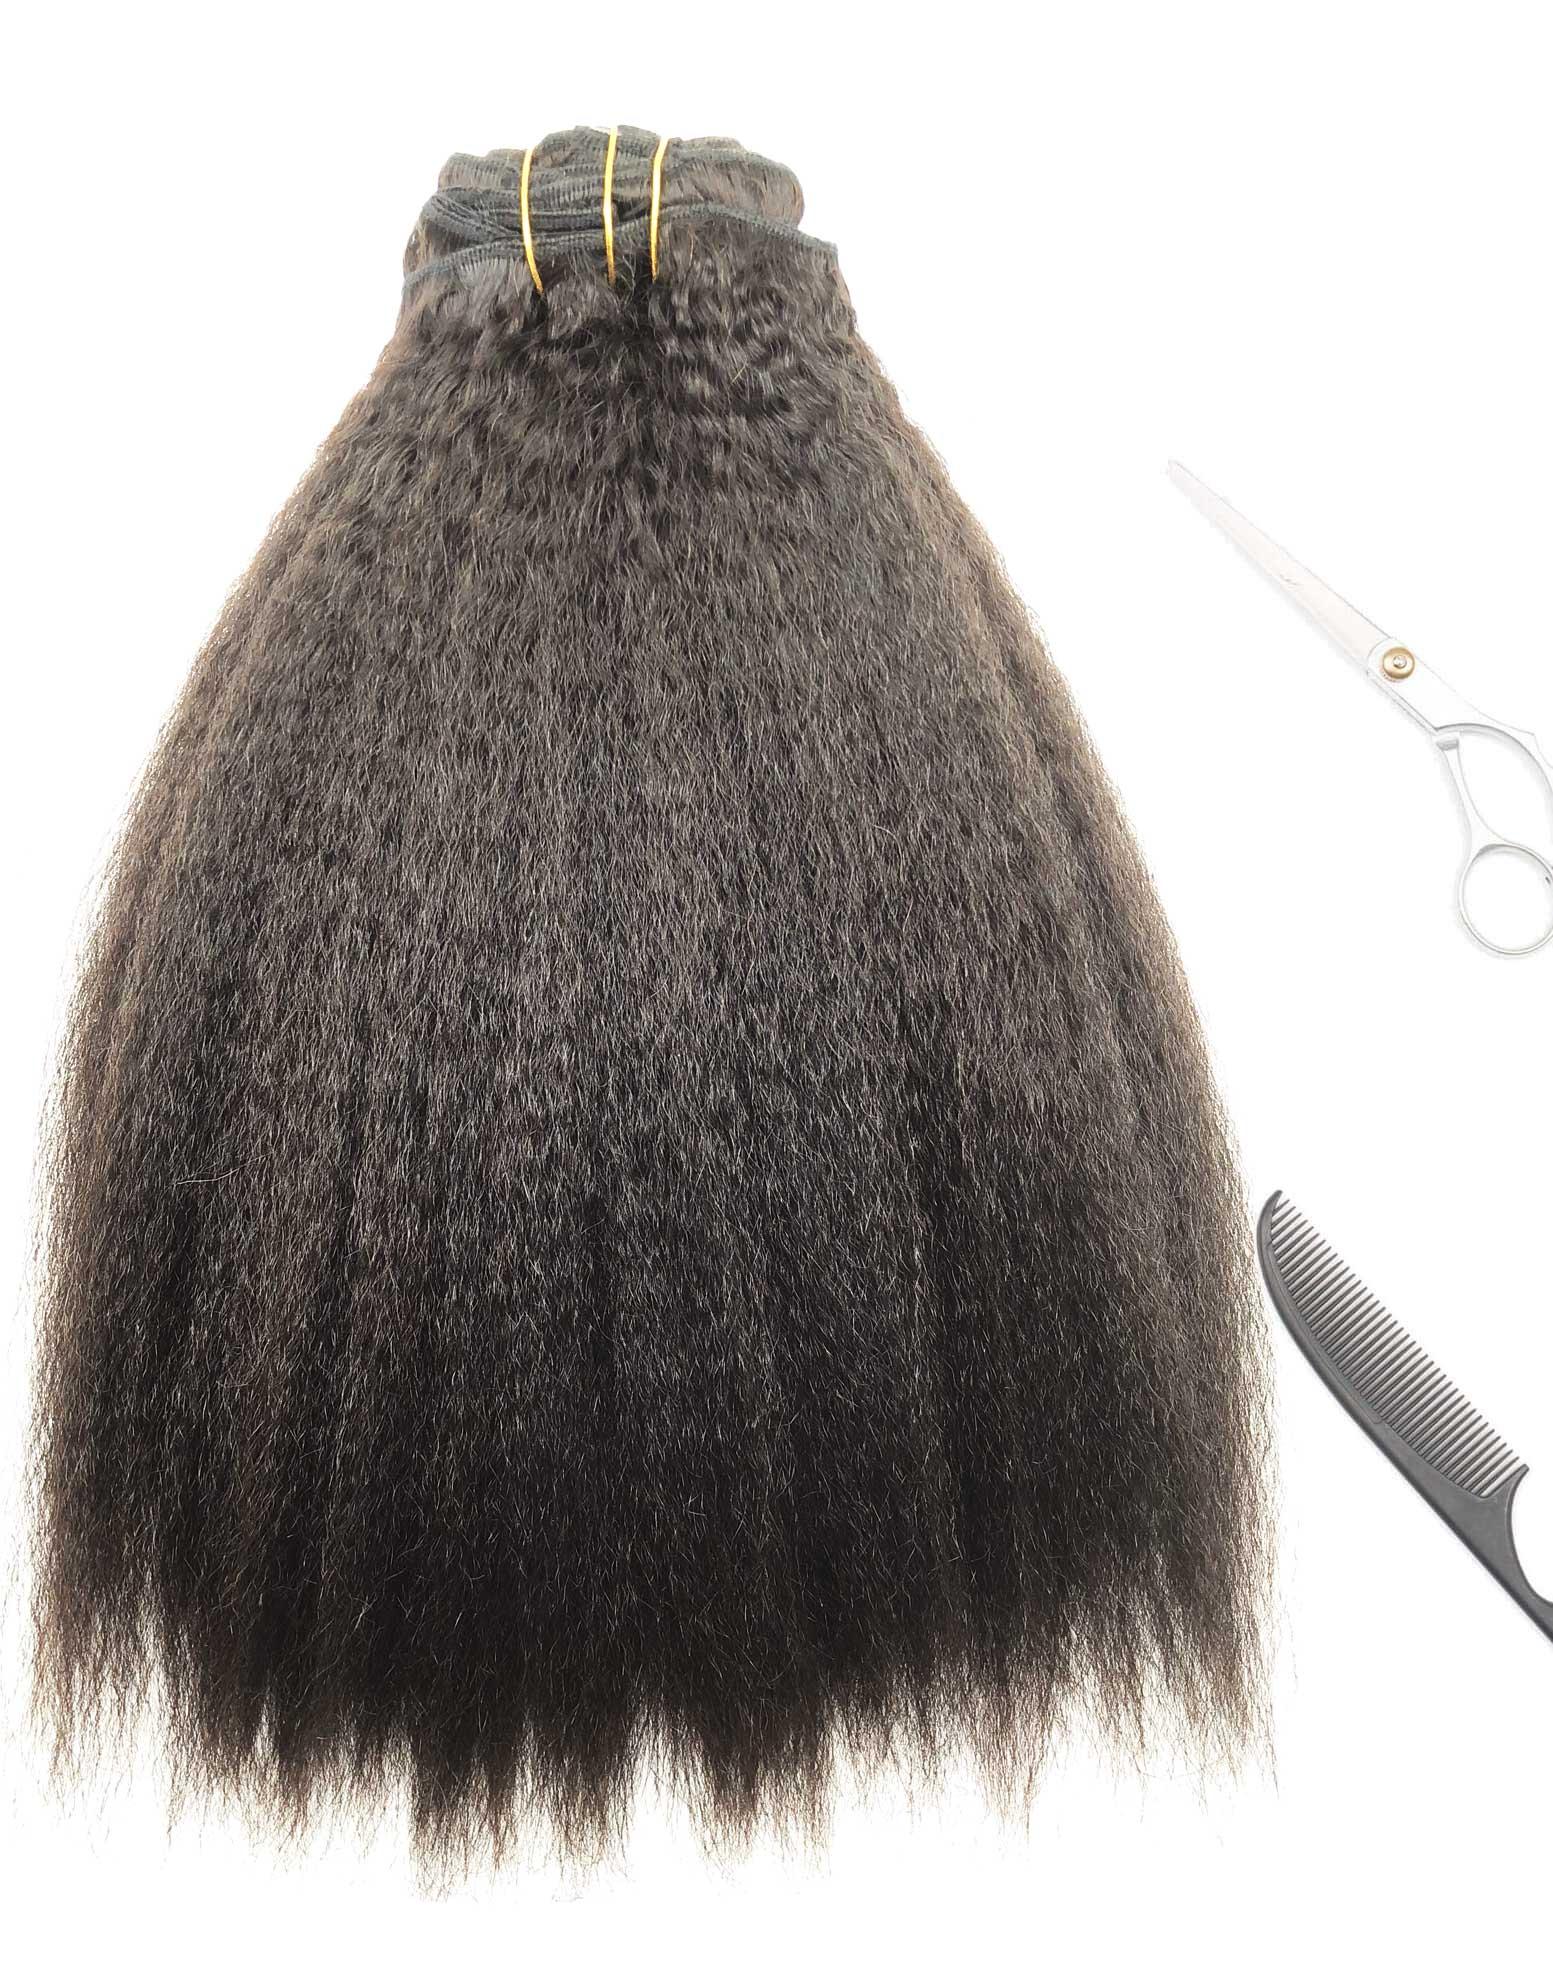 Kinky Coarse ClipIn Hair Extensions  BetterLengthcom